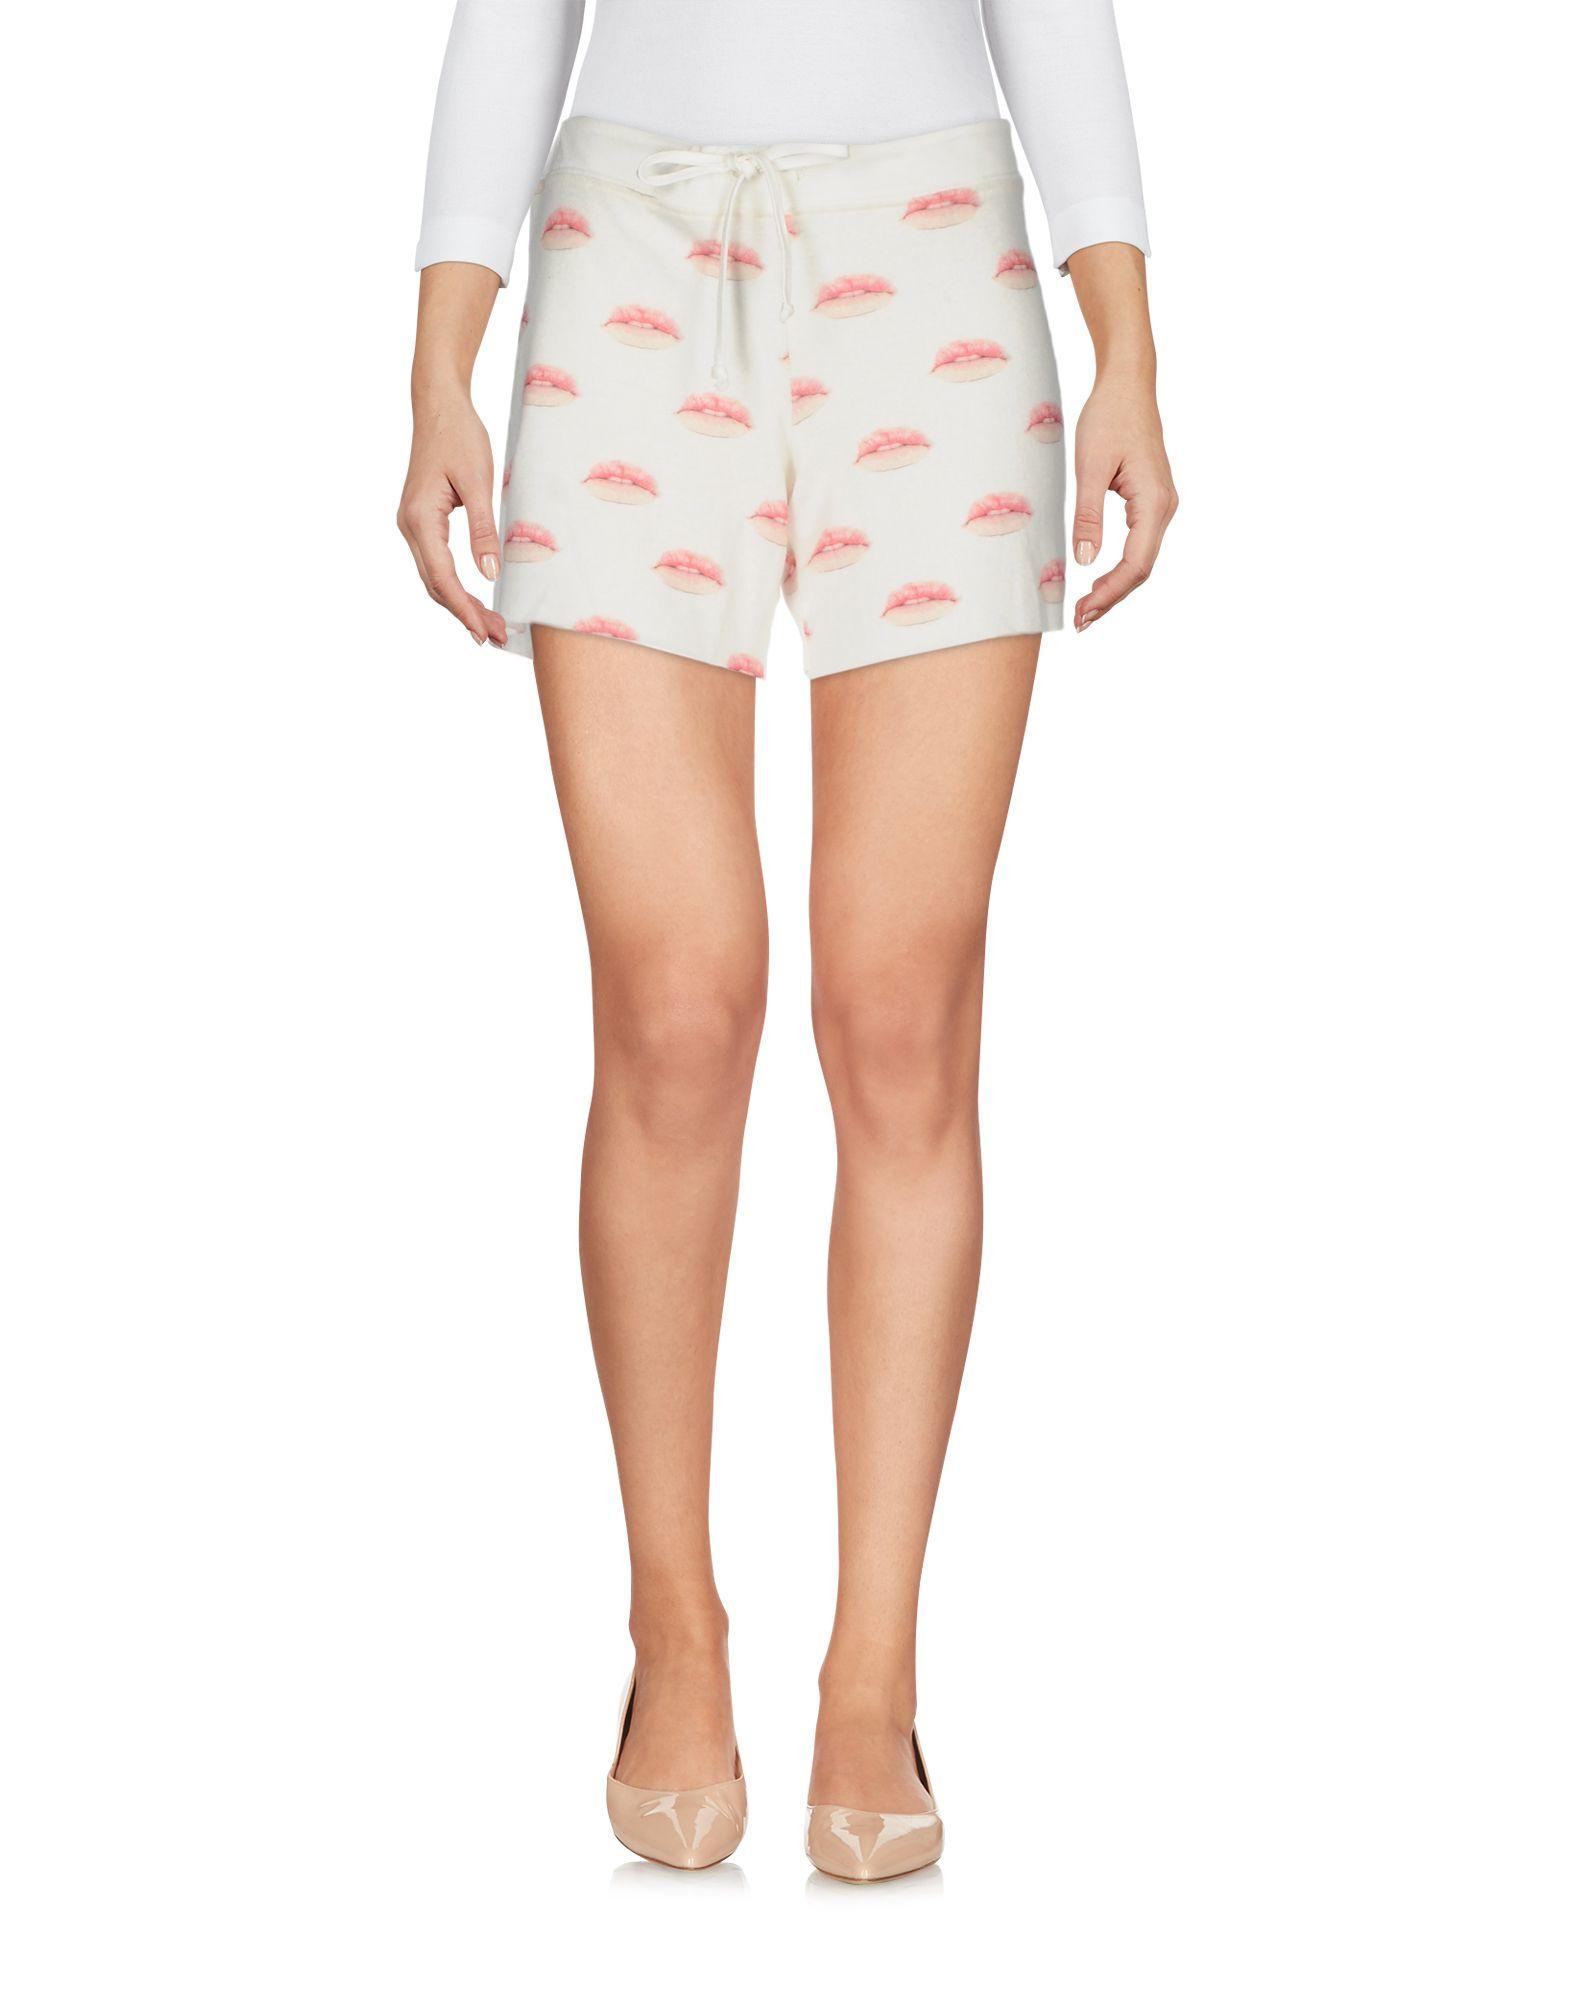 ALL THINGS FABULOUS Shorts & Bermuda in White